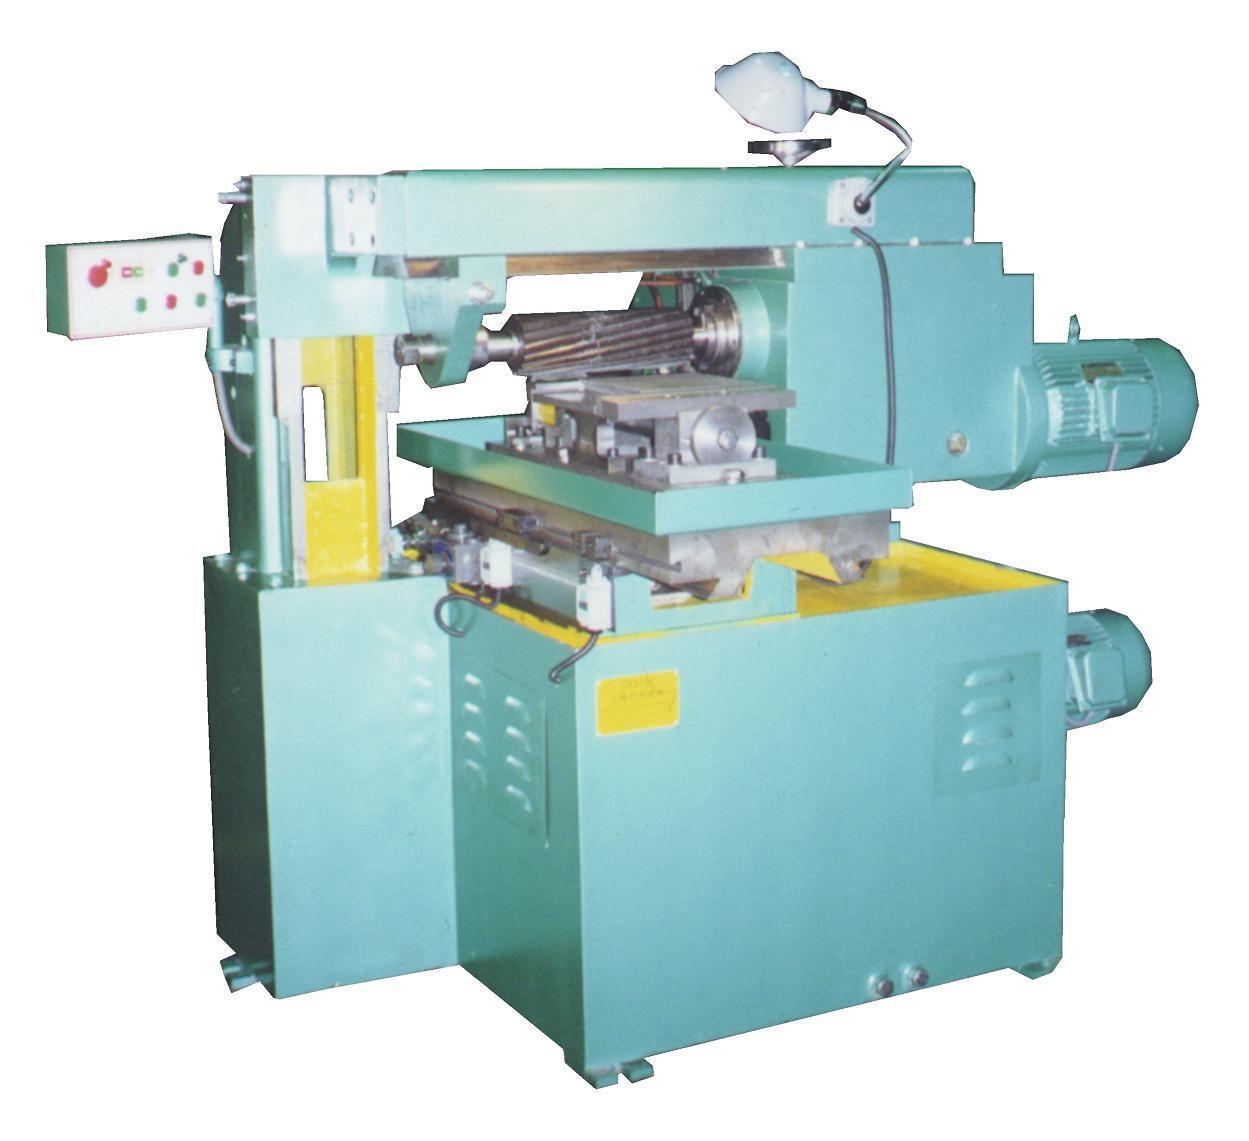 Horizontal Milling Machine Gx6138 China Milling Millingmachine